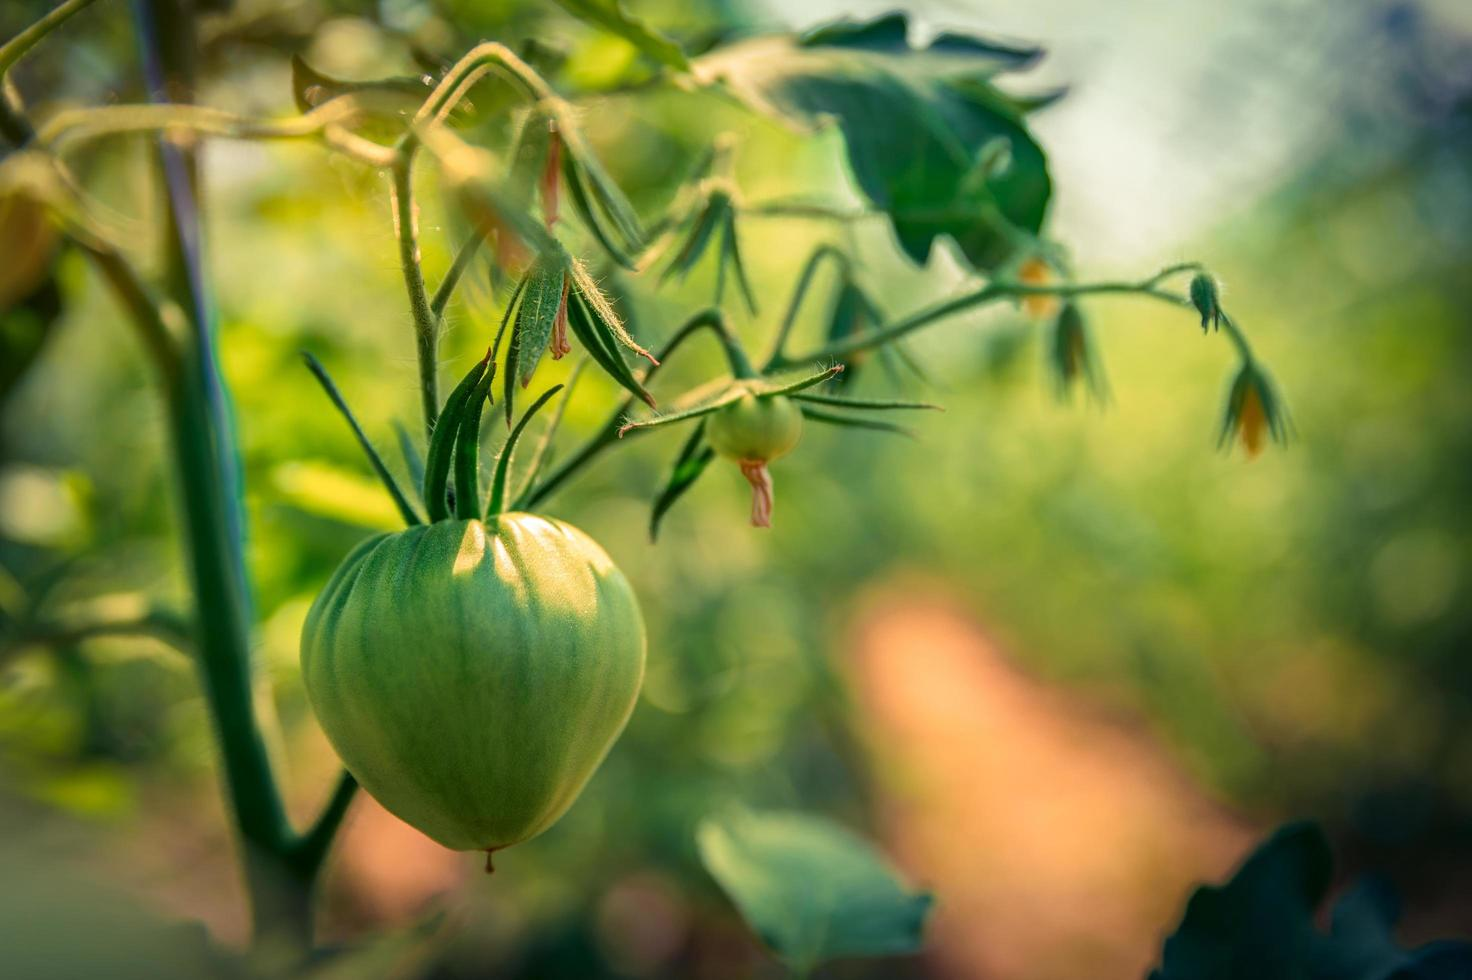 tomate orgânico amadurece na videira foto